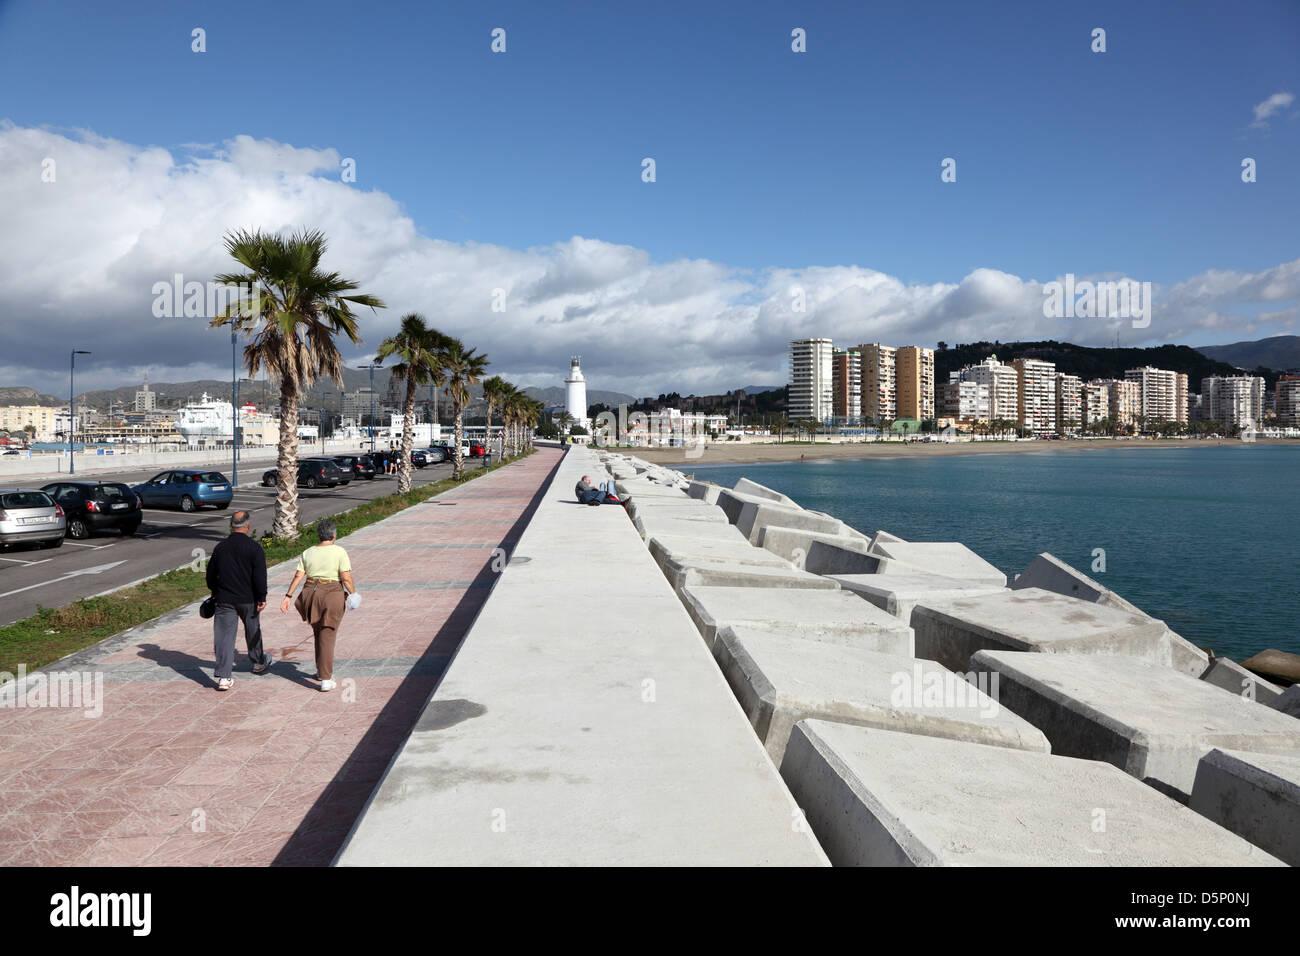 Promenade at the port of Malaga, Andalusia Spain - Stock Image